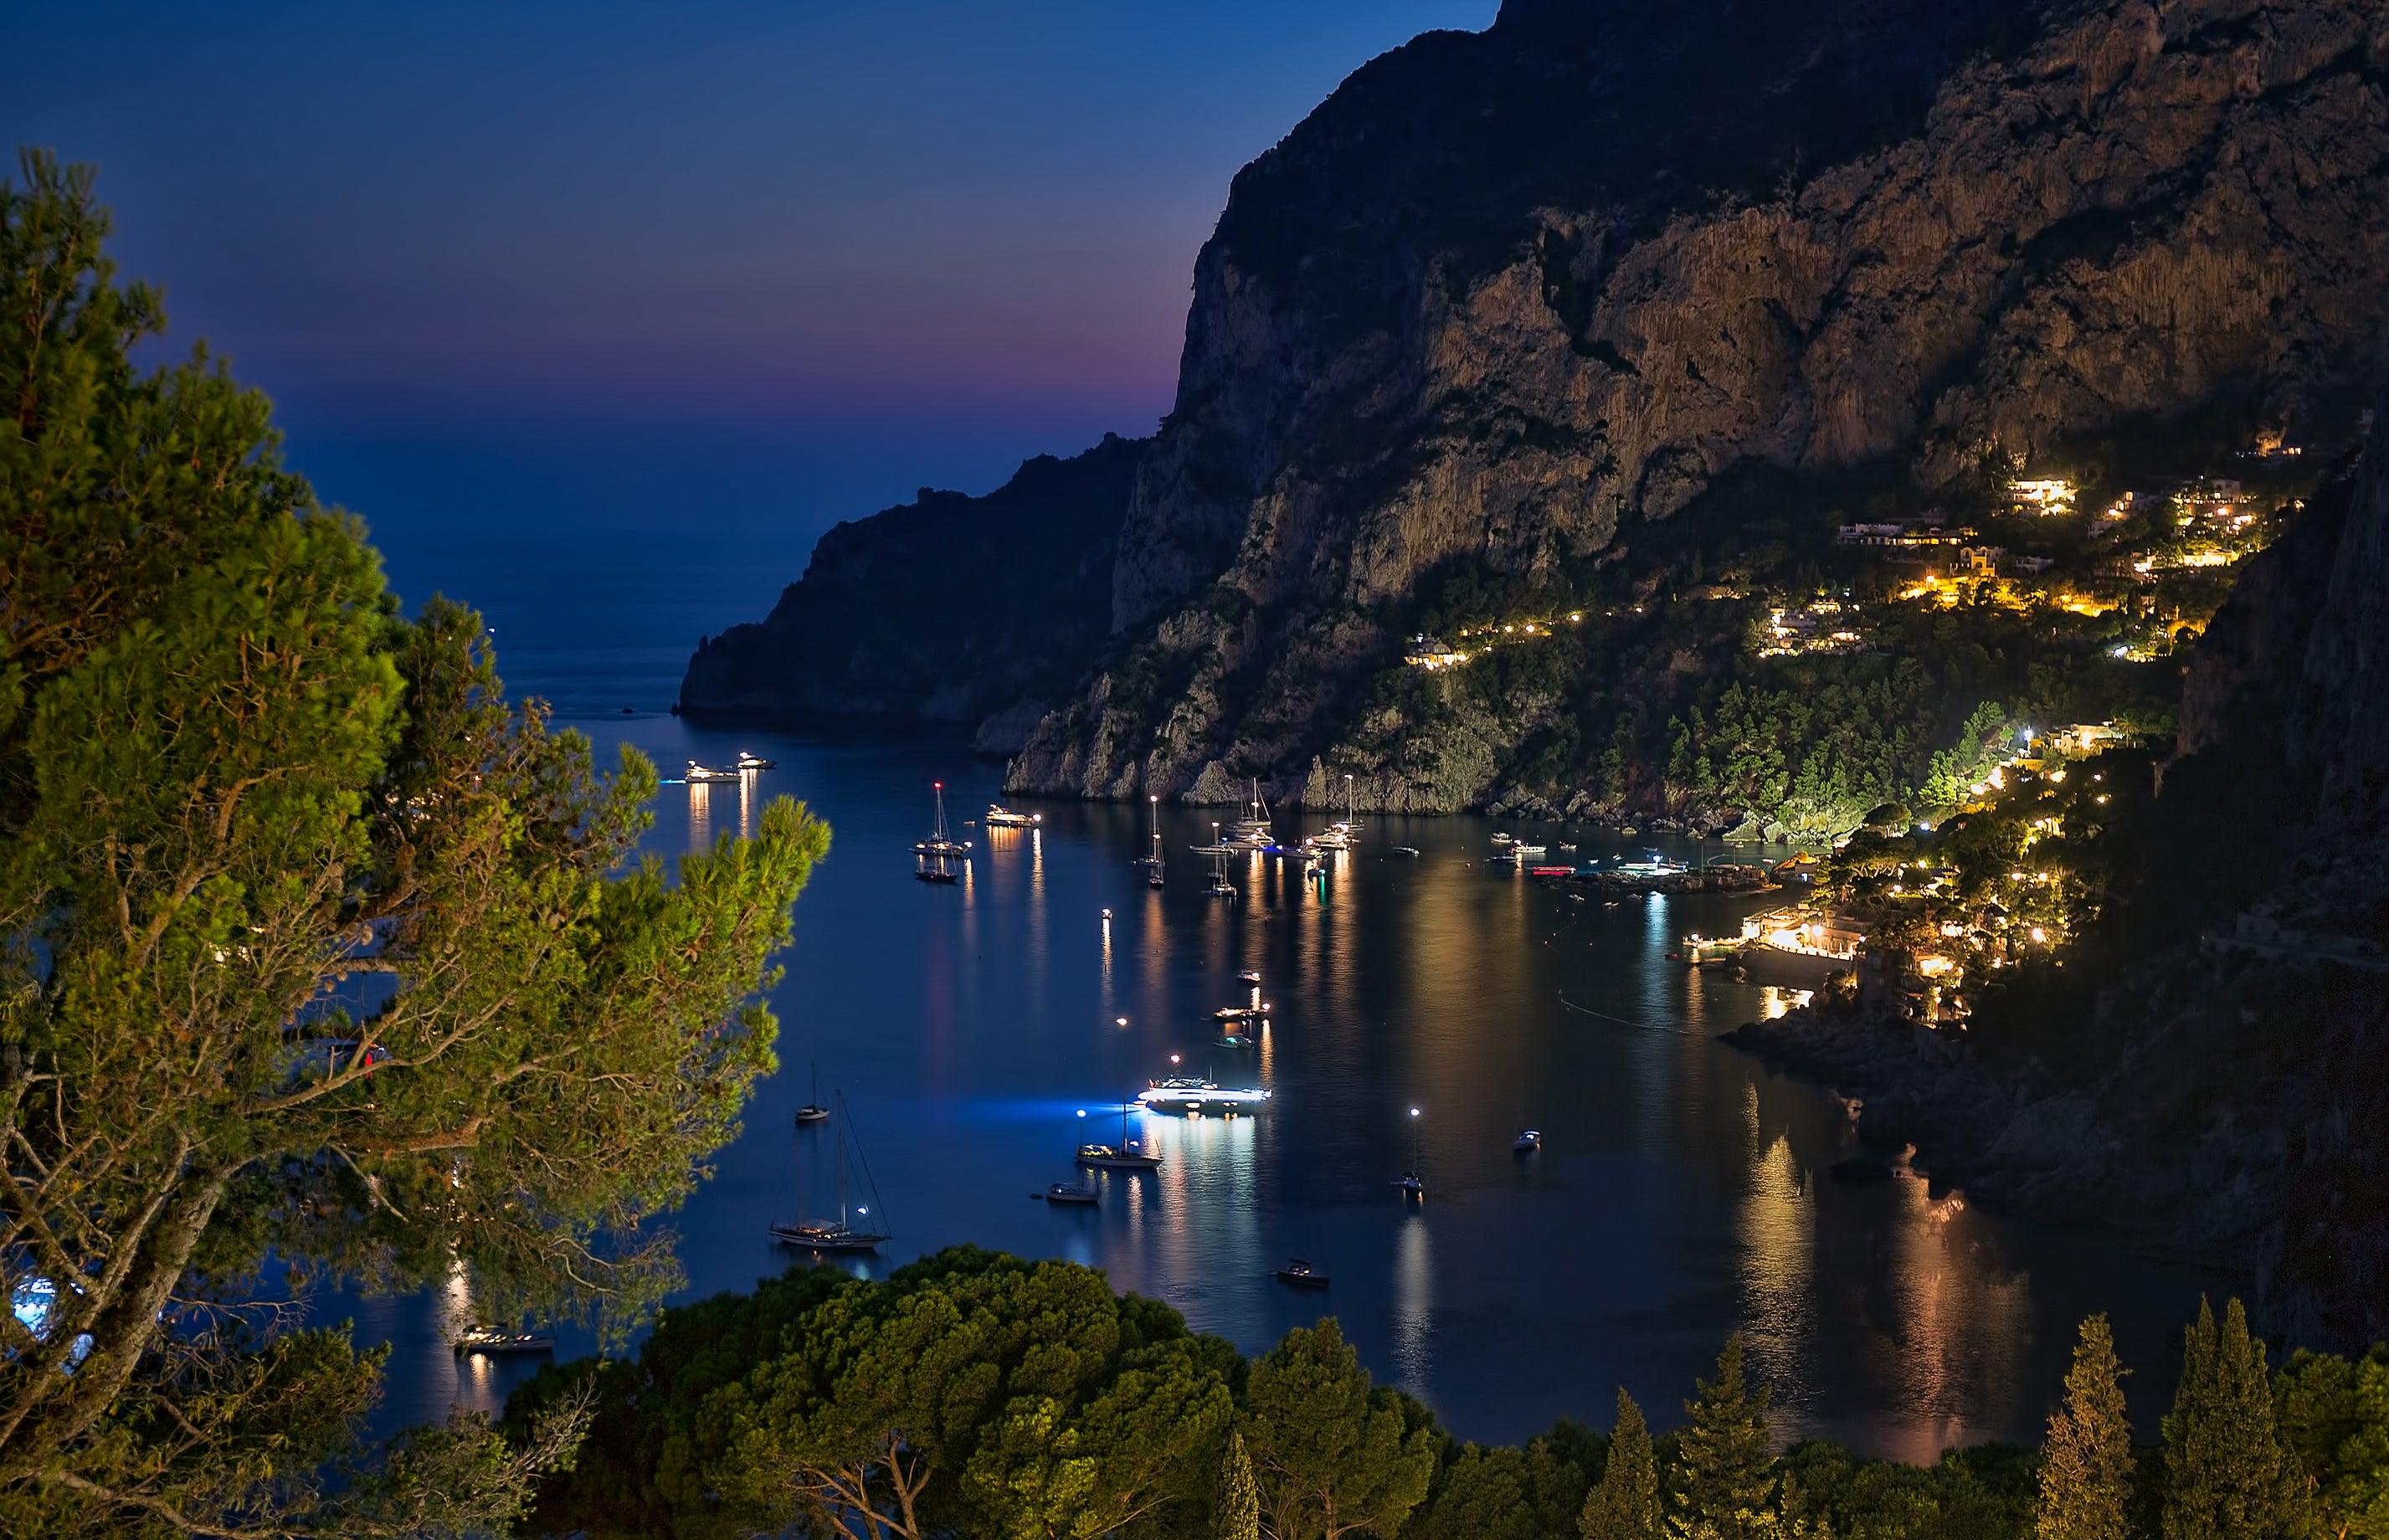 Terrazza Brunella Travel Guidebook Must Visit Attractions